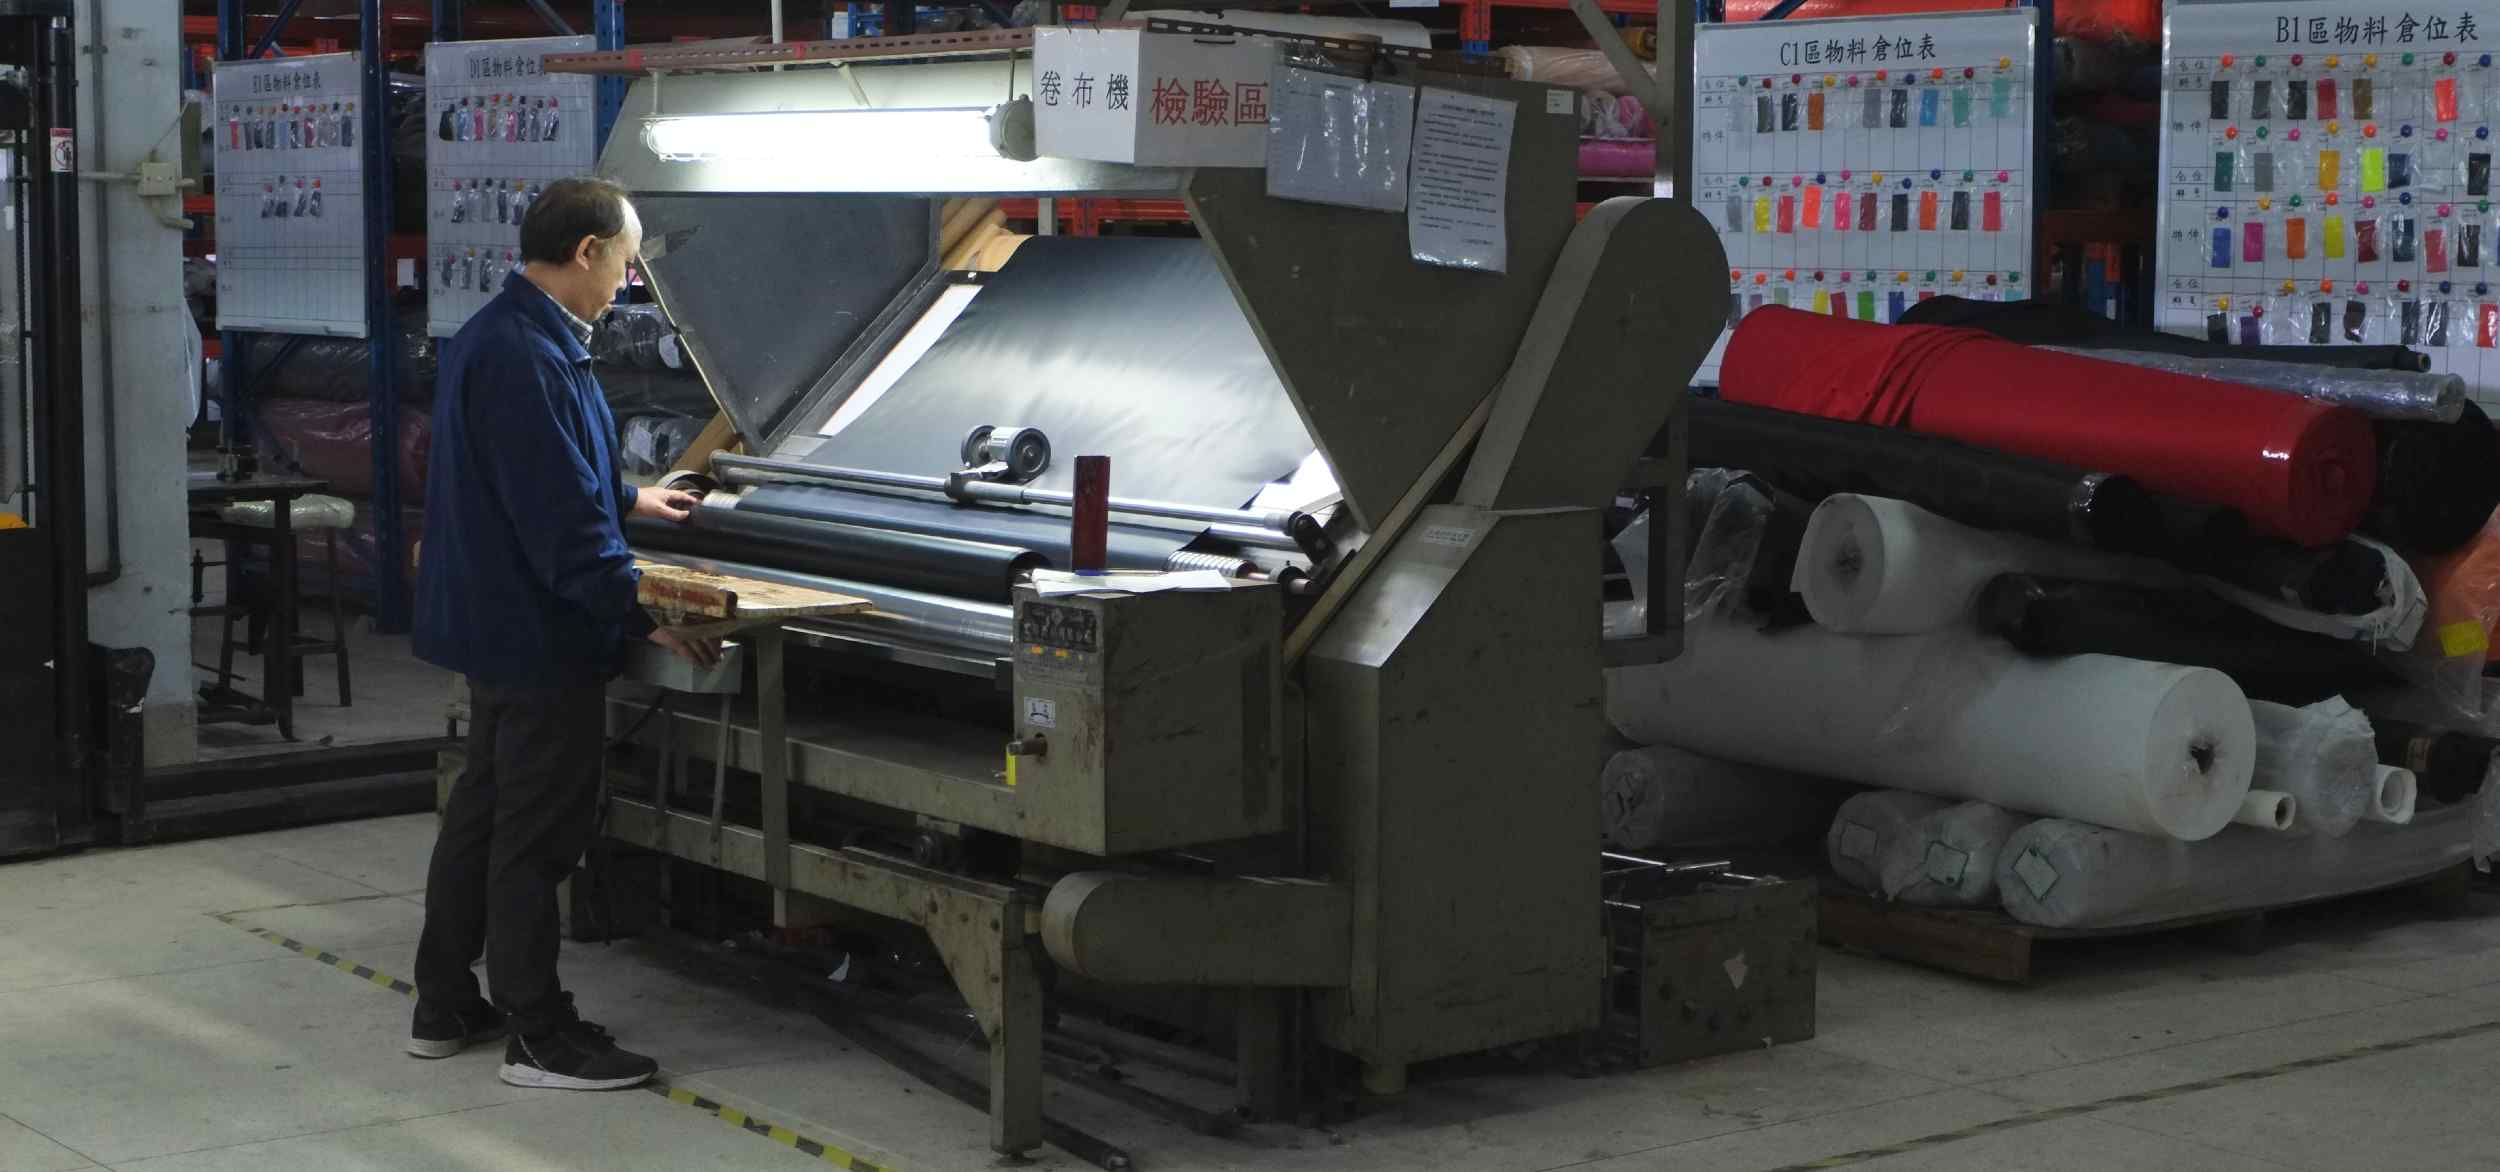 A technician uses a machine to process fabric